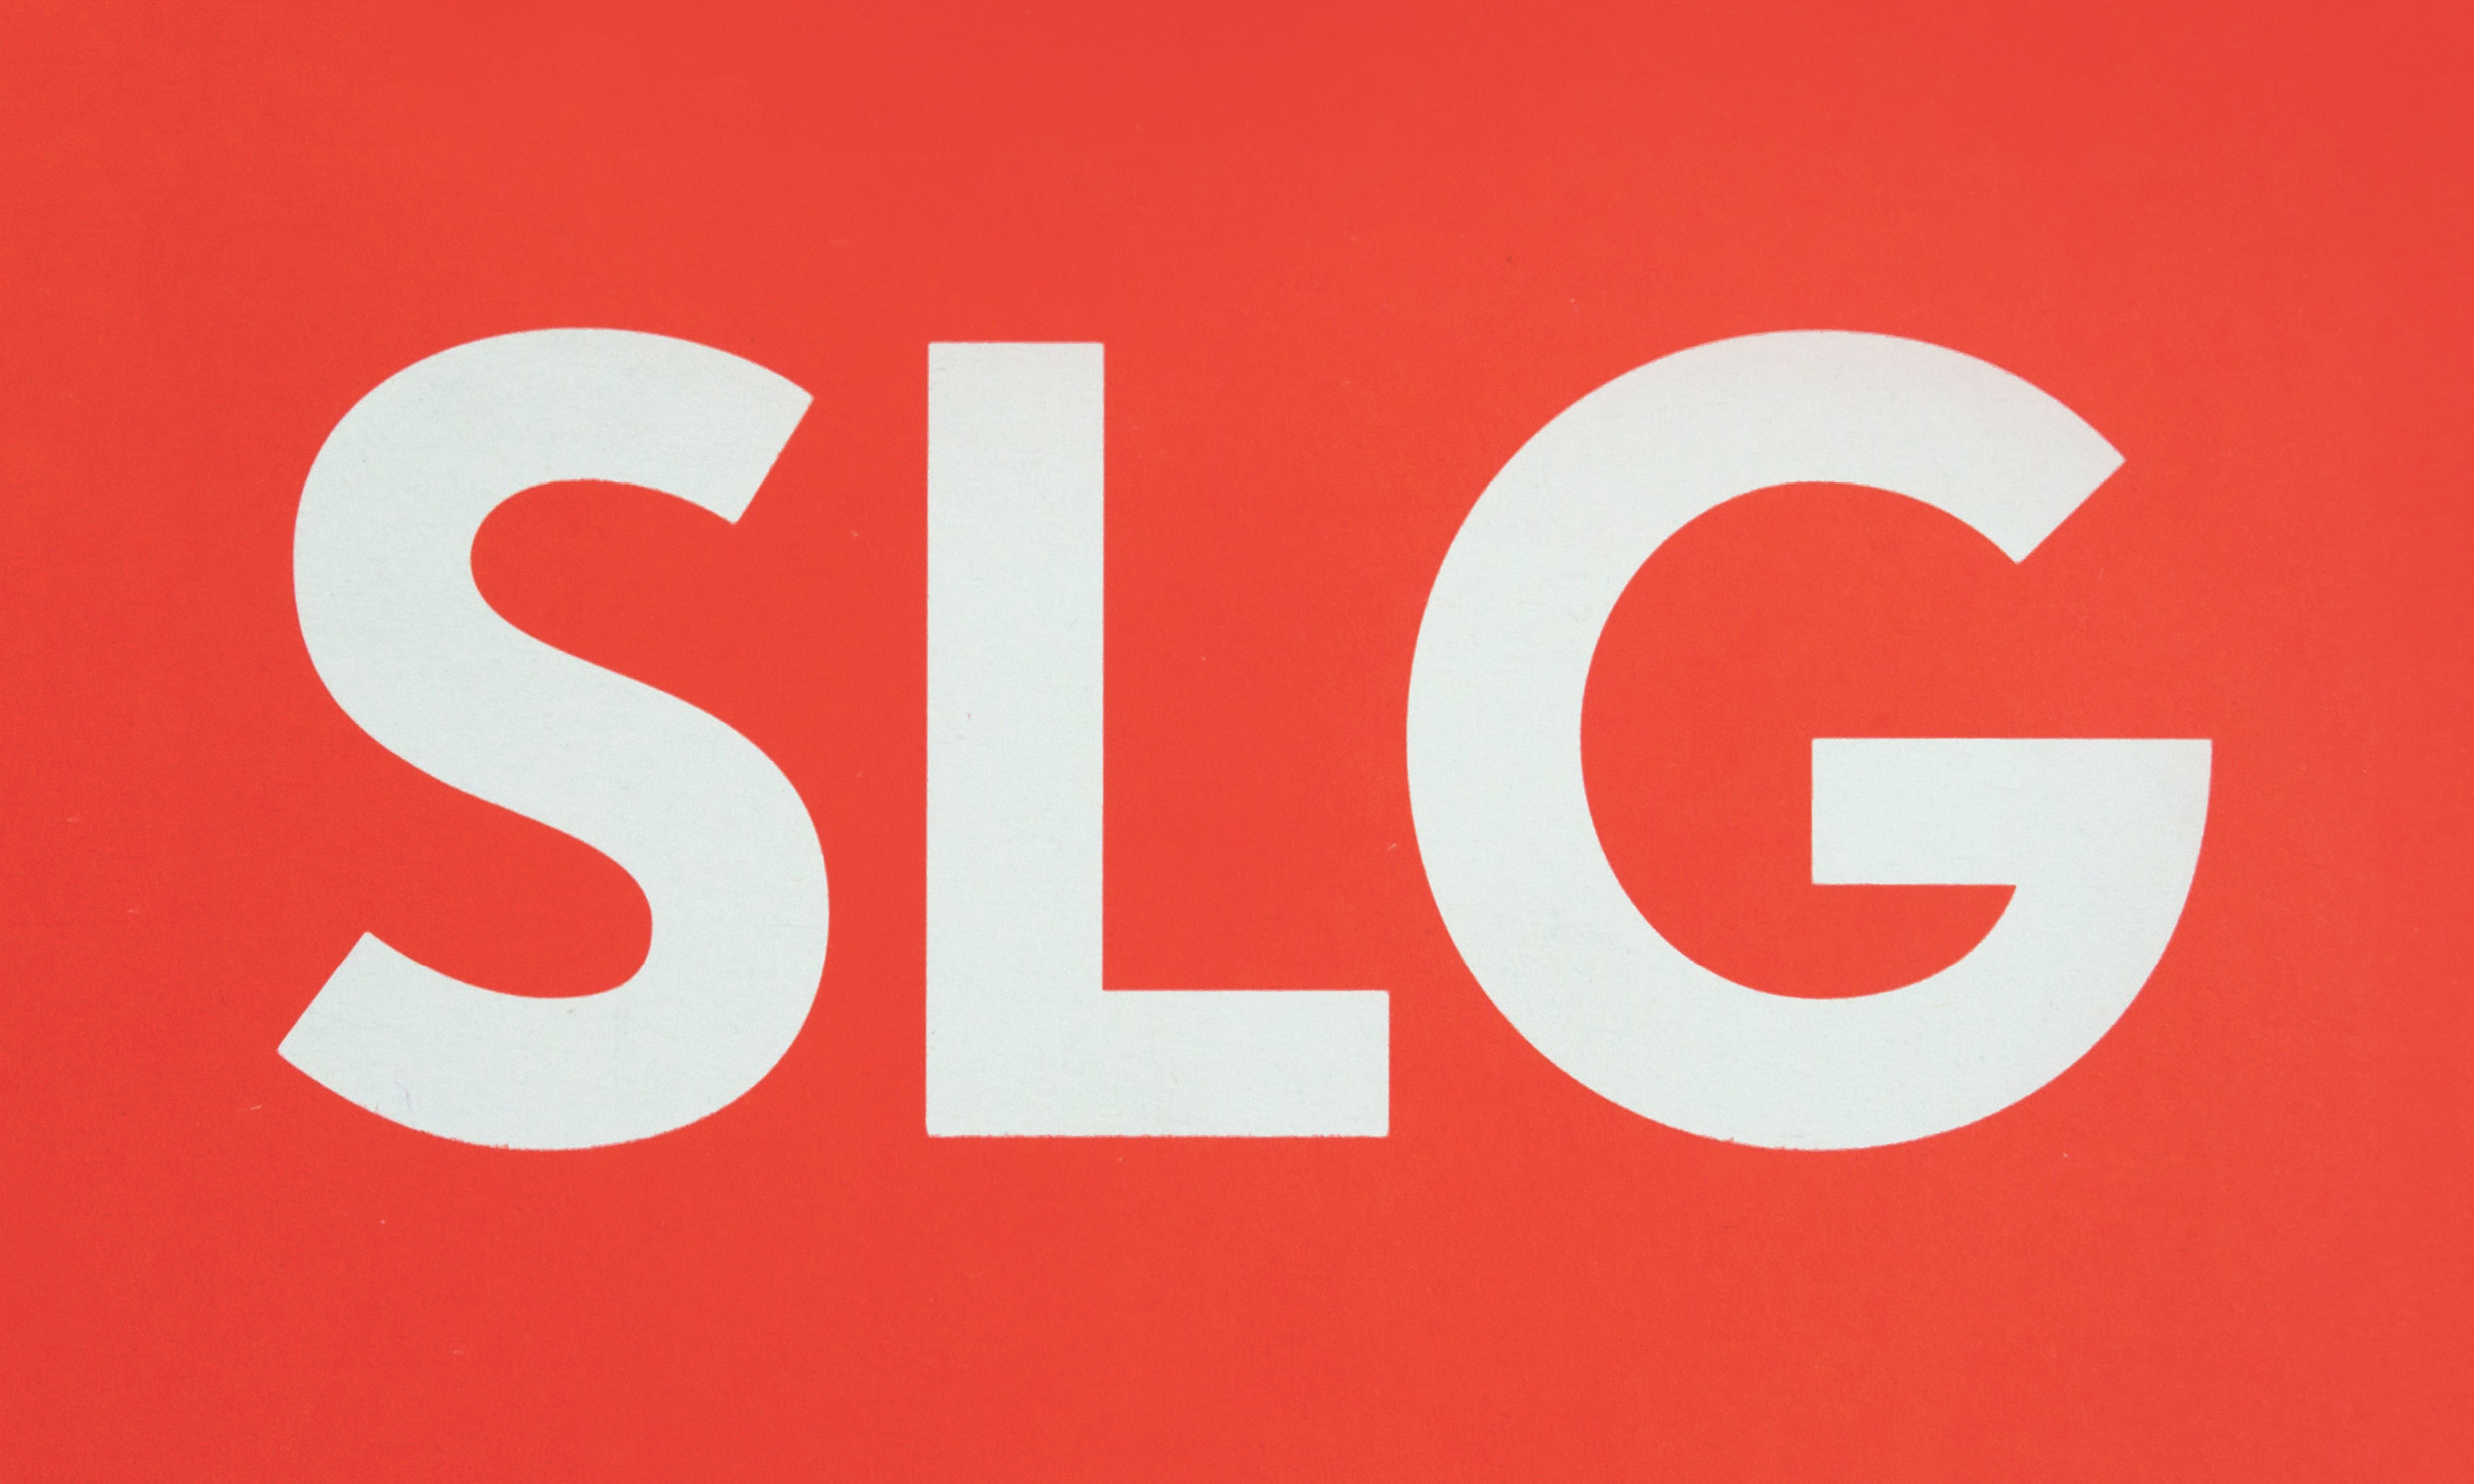 SLG-logo-R-LR.jpg